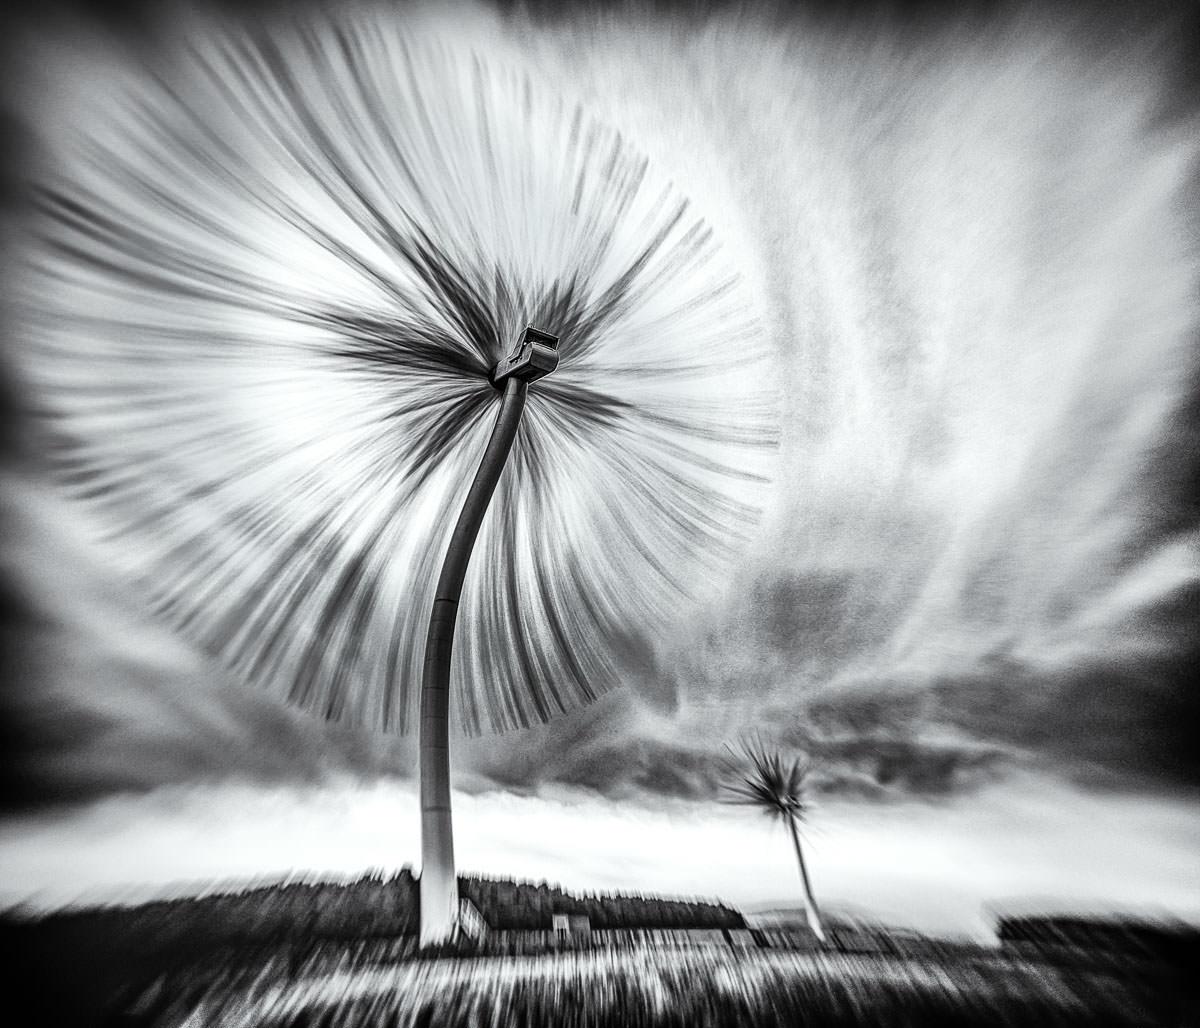 Surreal Image of a Turbo Dandelion Wind Farm